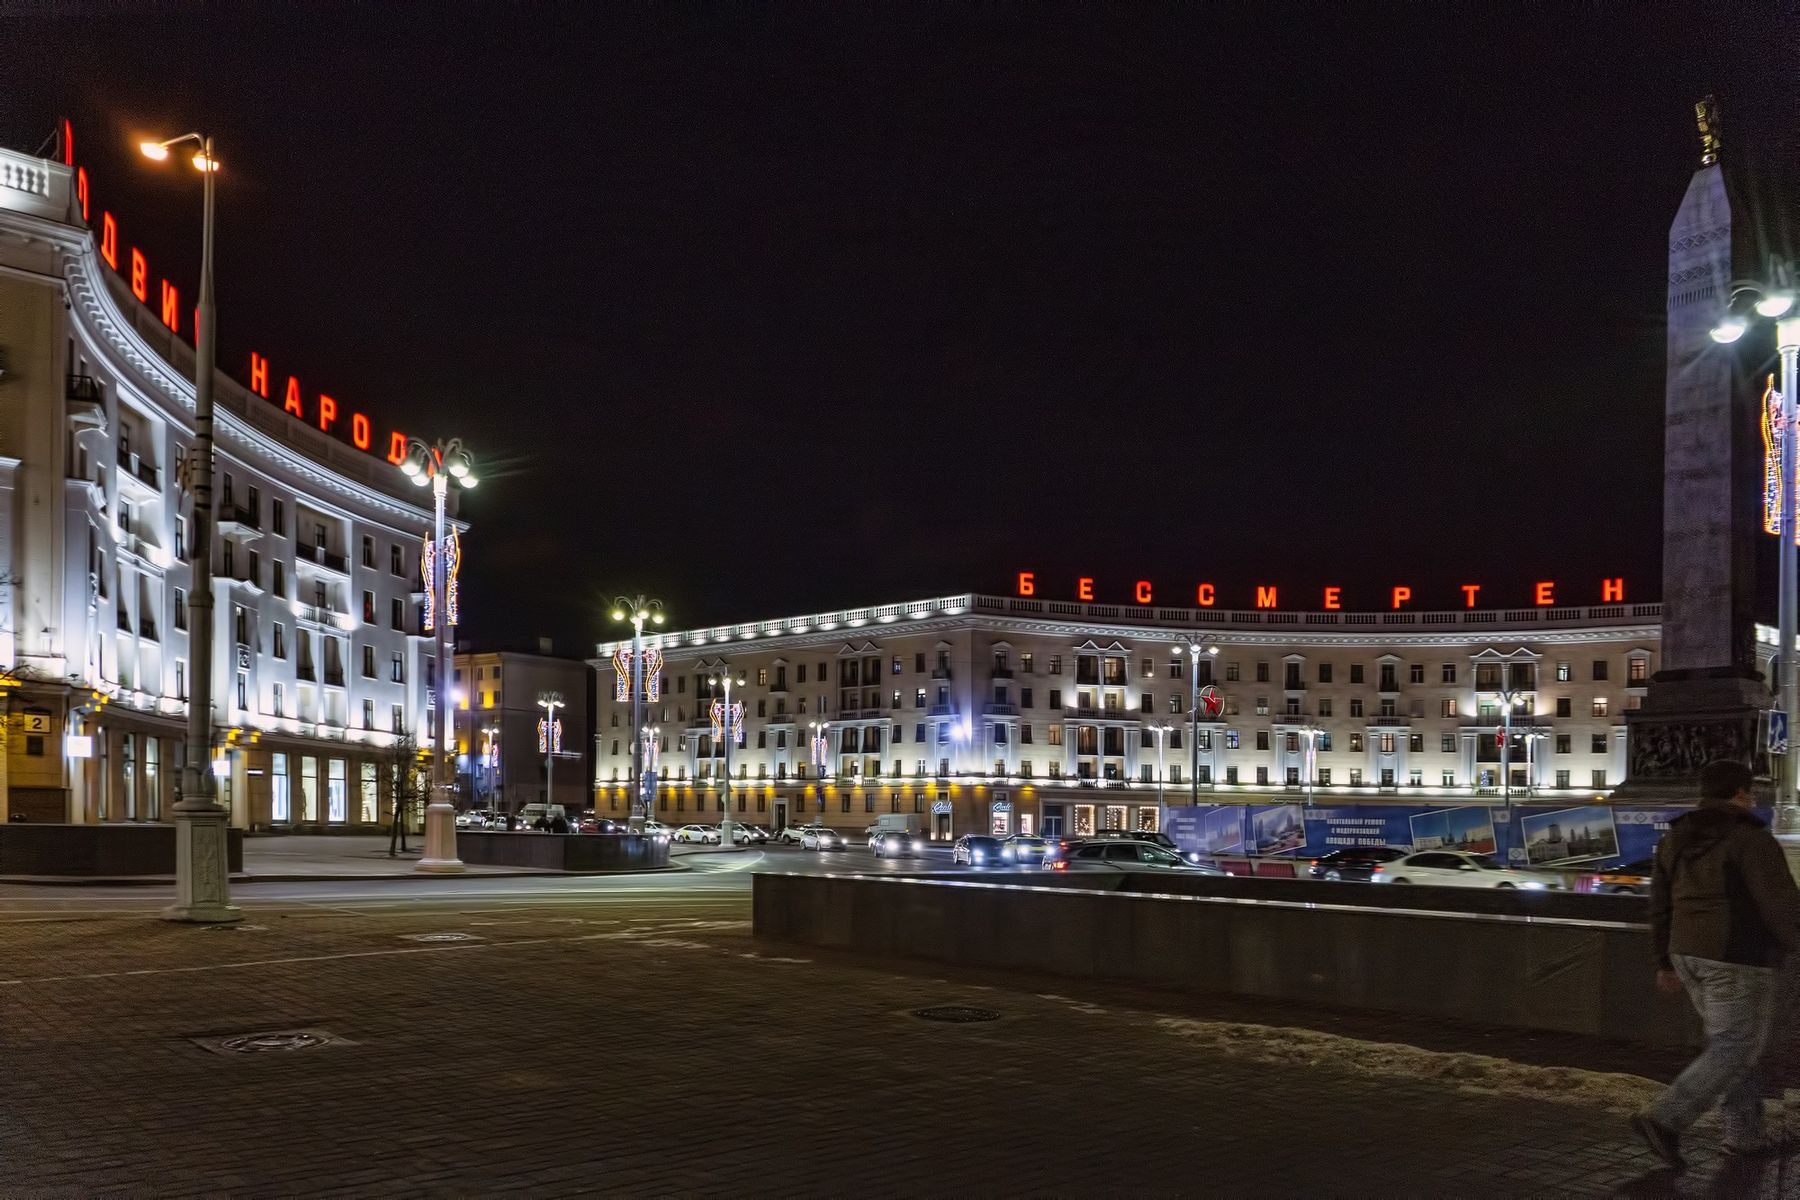 Вечерний Минск архитектура город Минск путешествие